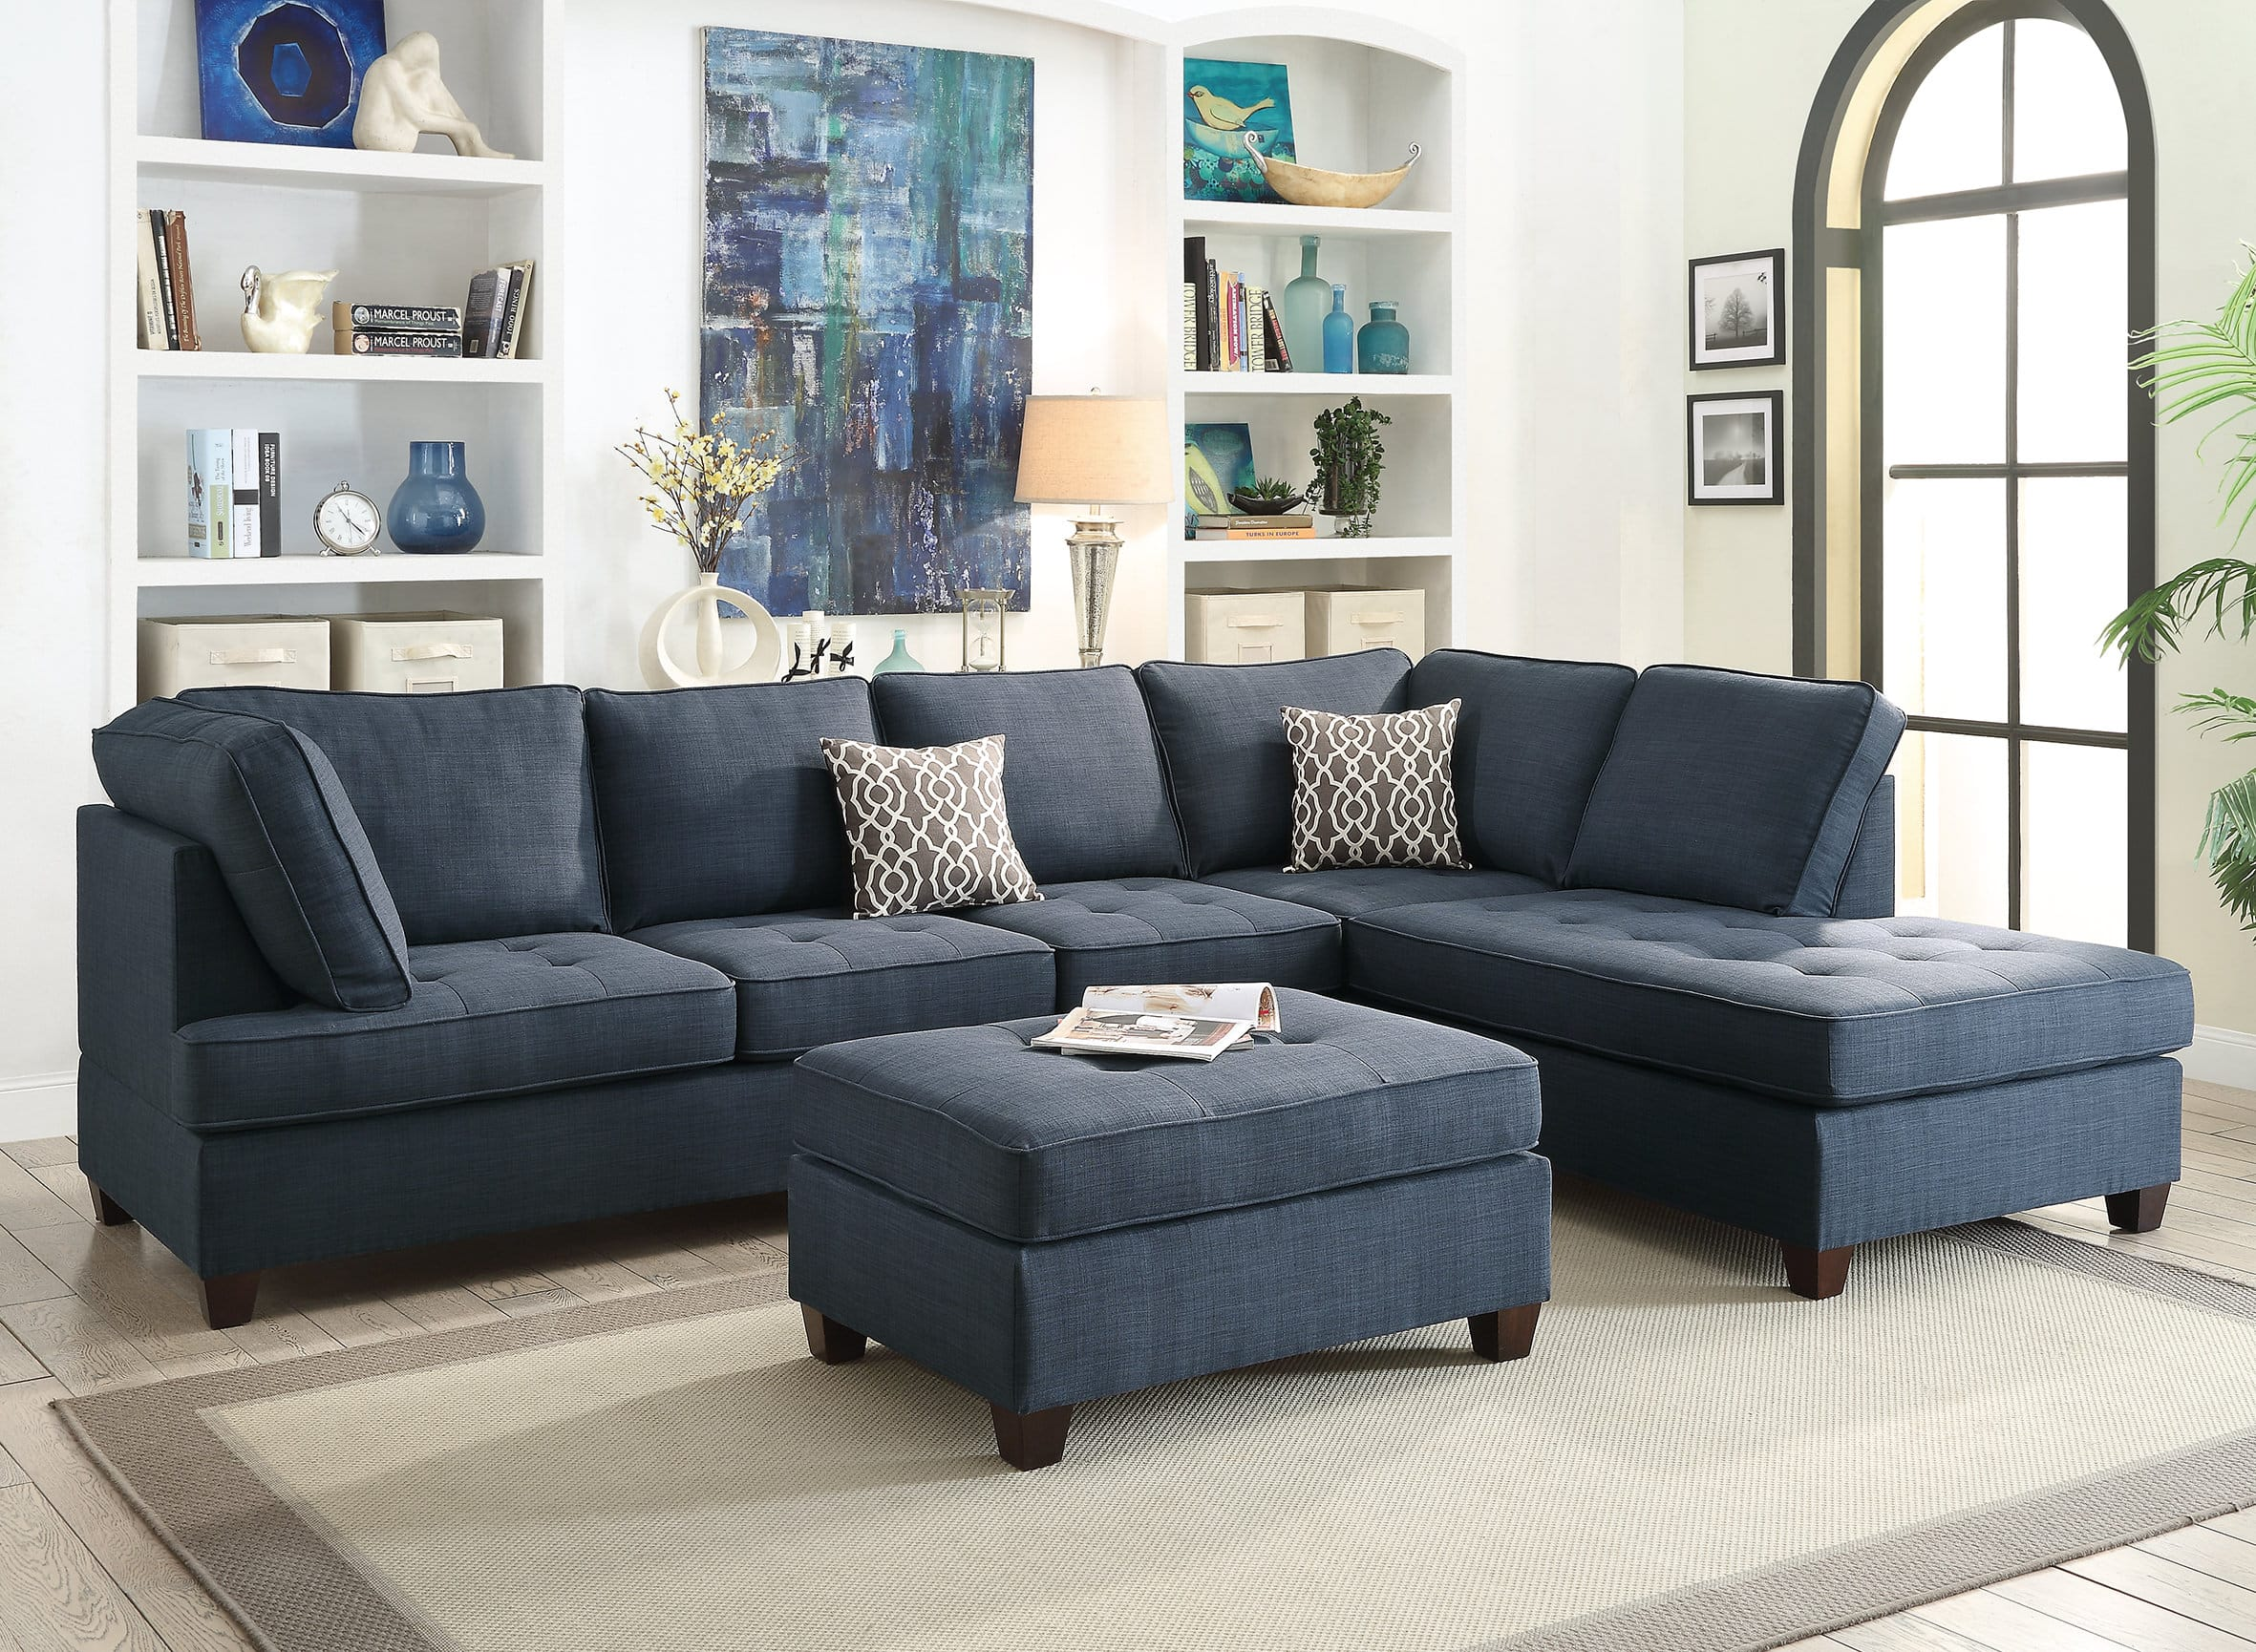 F Dark Blue 2 Pcs Sectional Sofa Set by Poundex